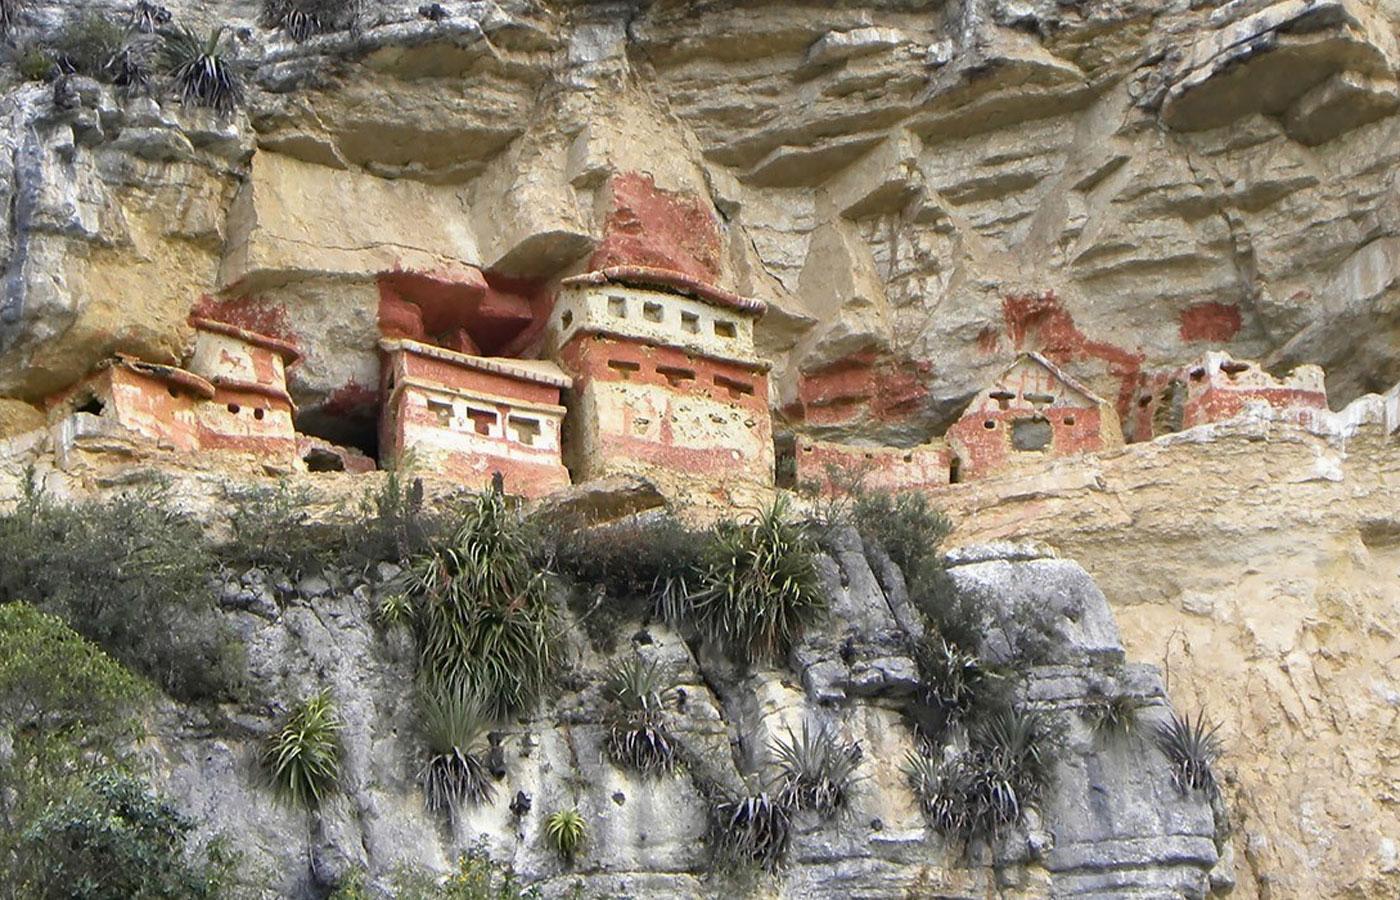 Revash - Luxury holiday to Peru